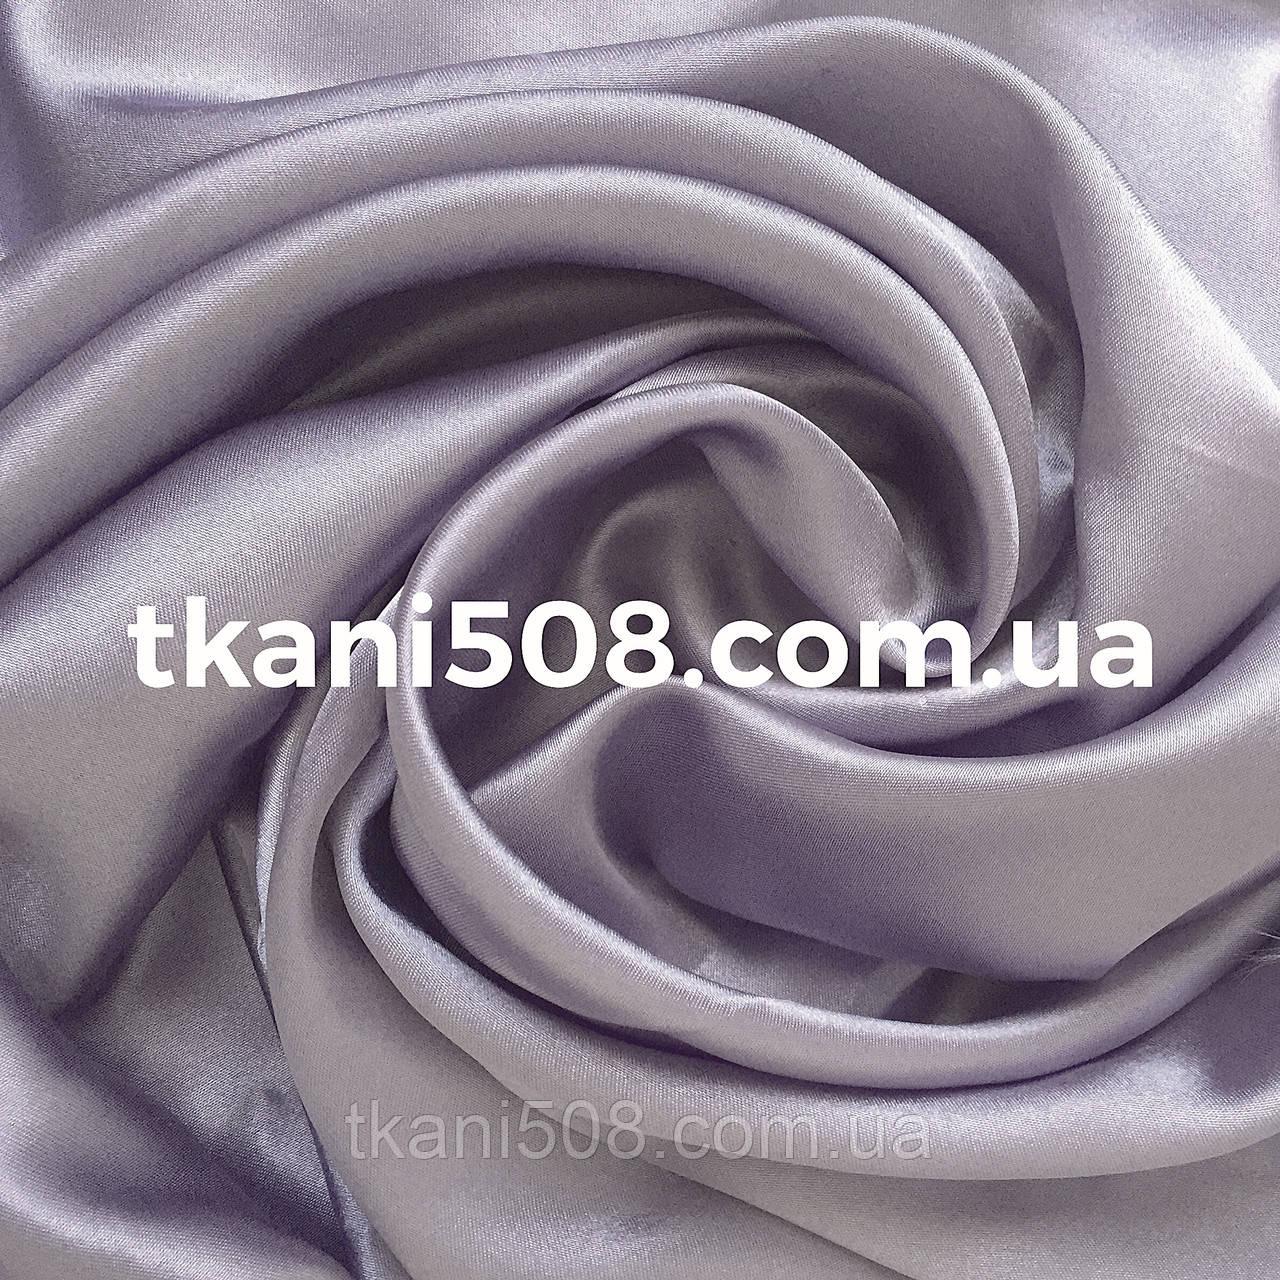 Ткань Атлас Светло-серый (серебро)(20)